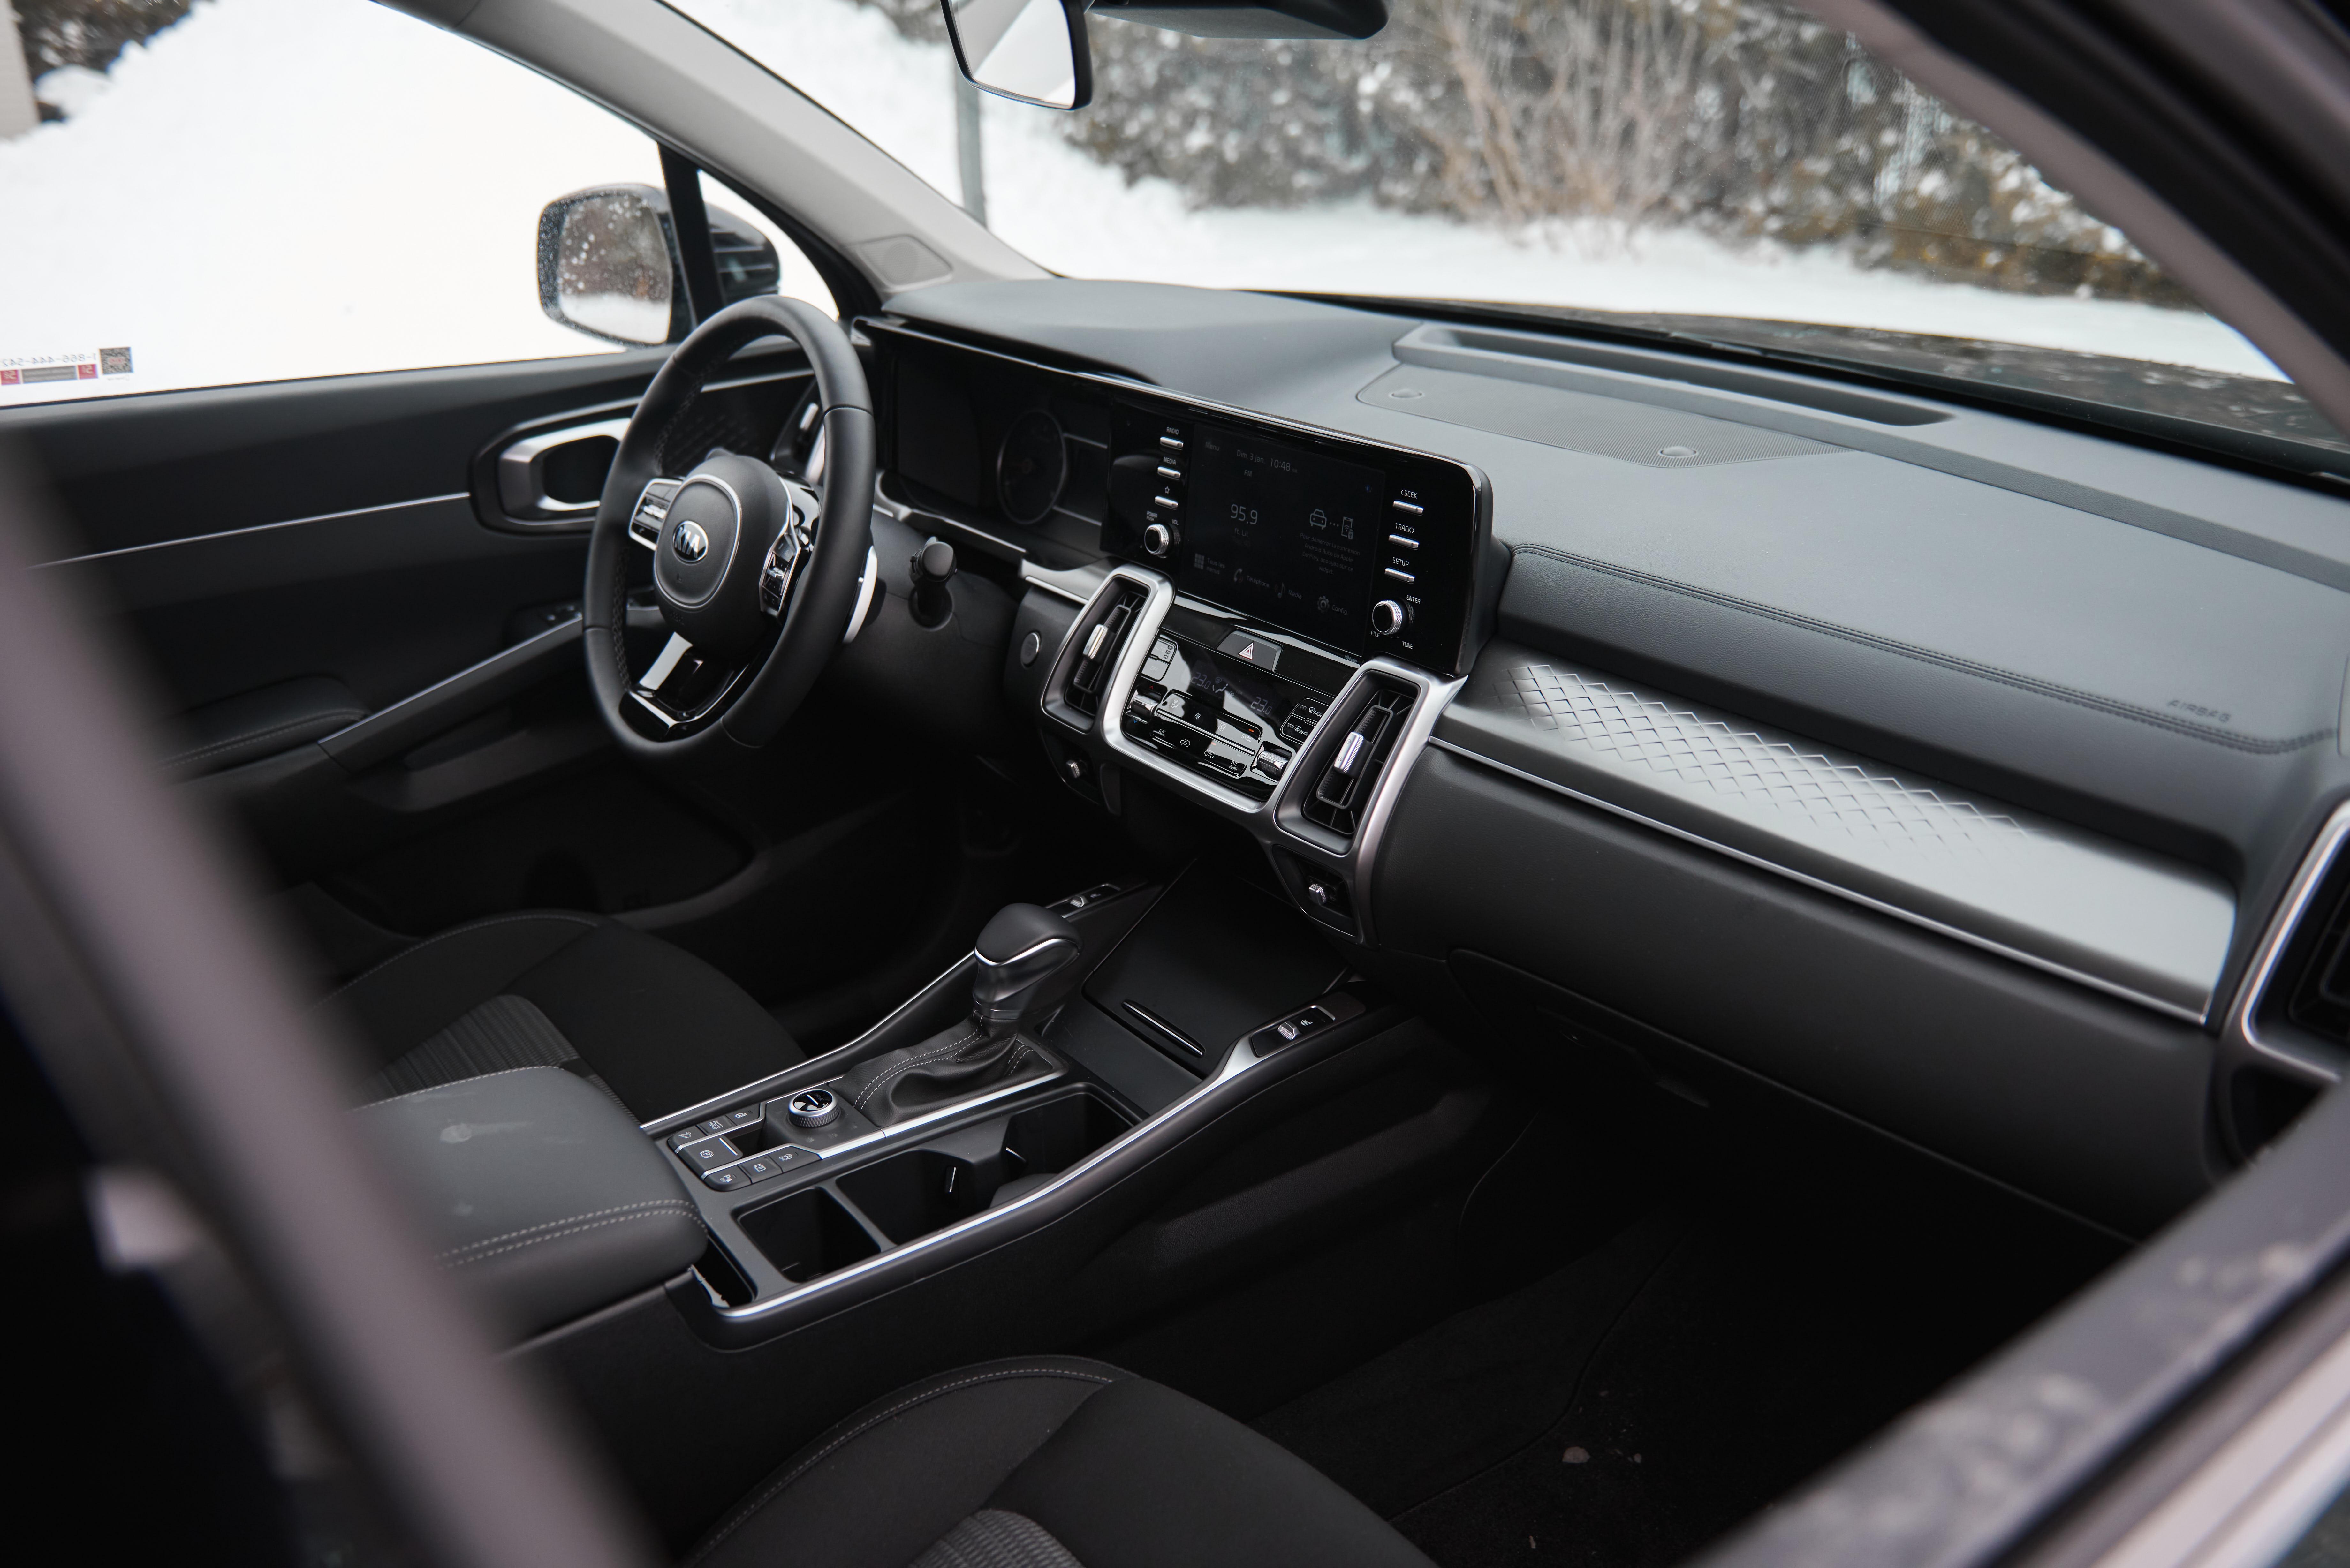 2021 Kia Sorento Interior | Clavey's Corner